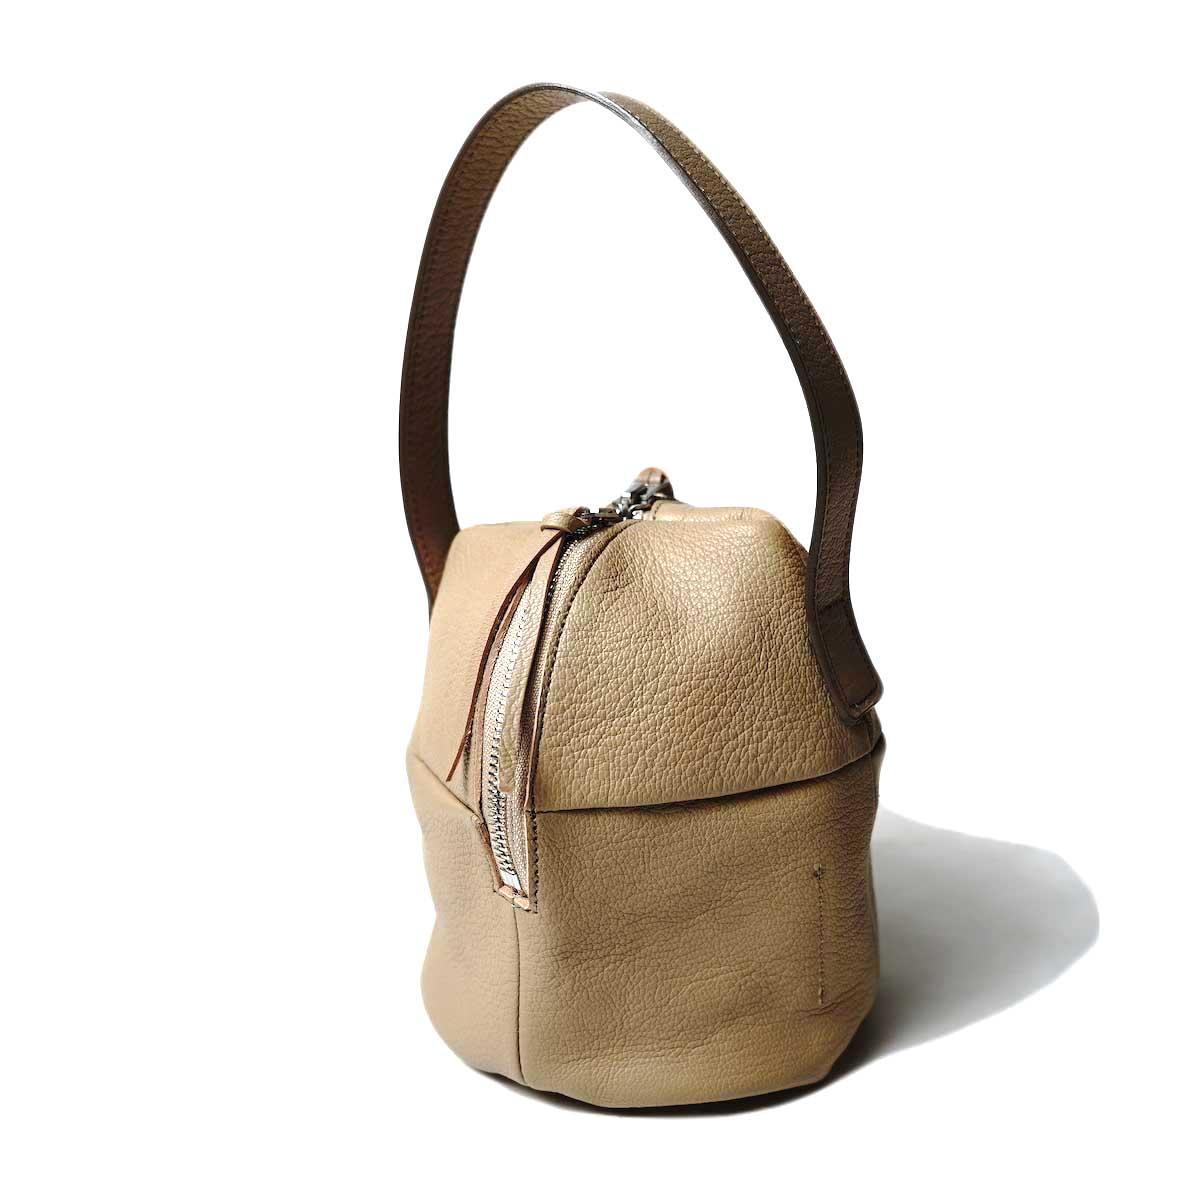 MYTHINKS / MY MINI DUFFLE BAG GOAT -Small- (Beige)